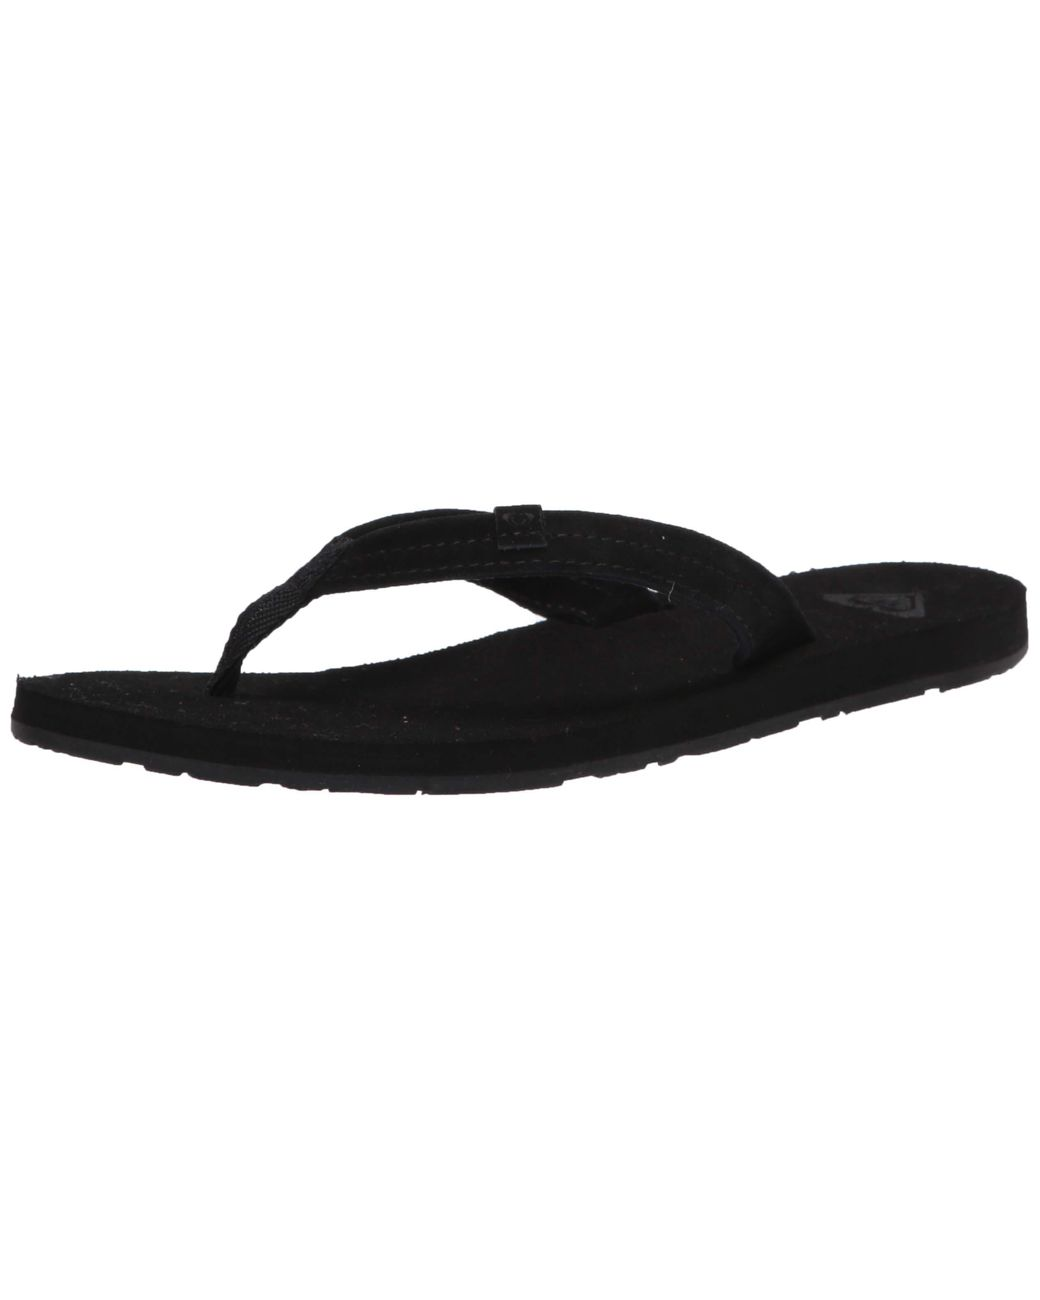 Roxy Womens Avila Suede Flip Flop Carver Sandal Sport Slide Sandal